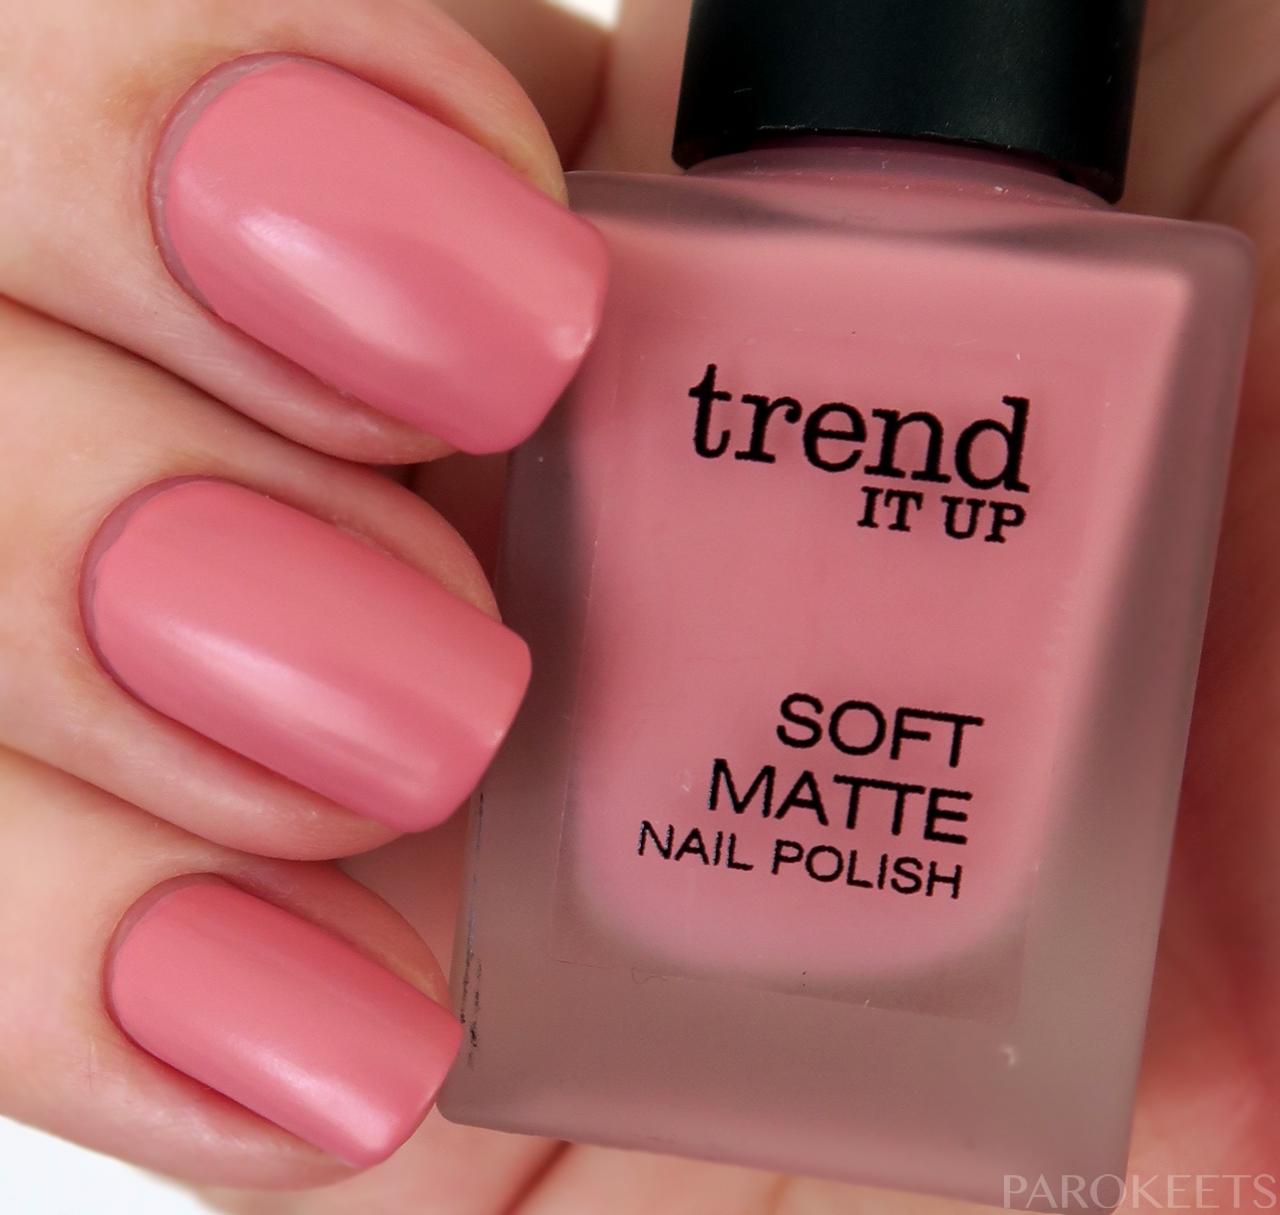 Trend It Up Soft Matte Nail Polishes Parokeets - 1280x1215 - jpeg